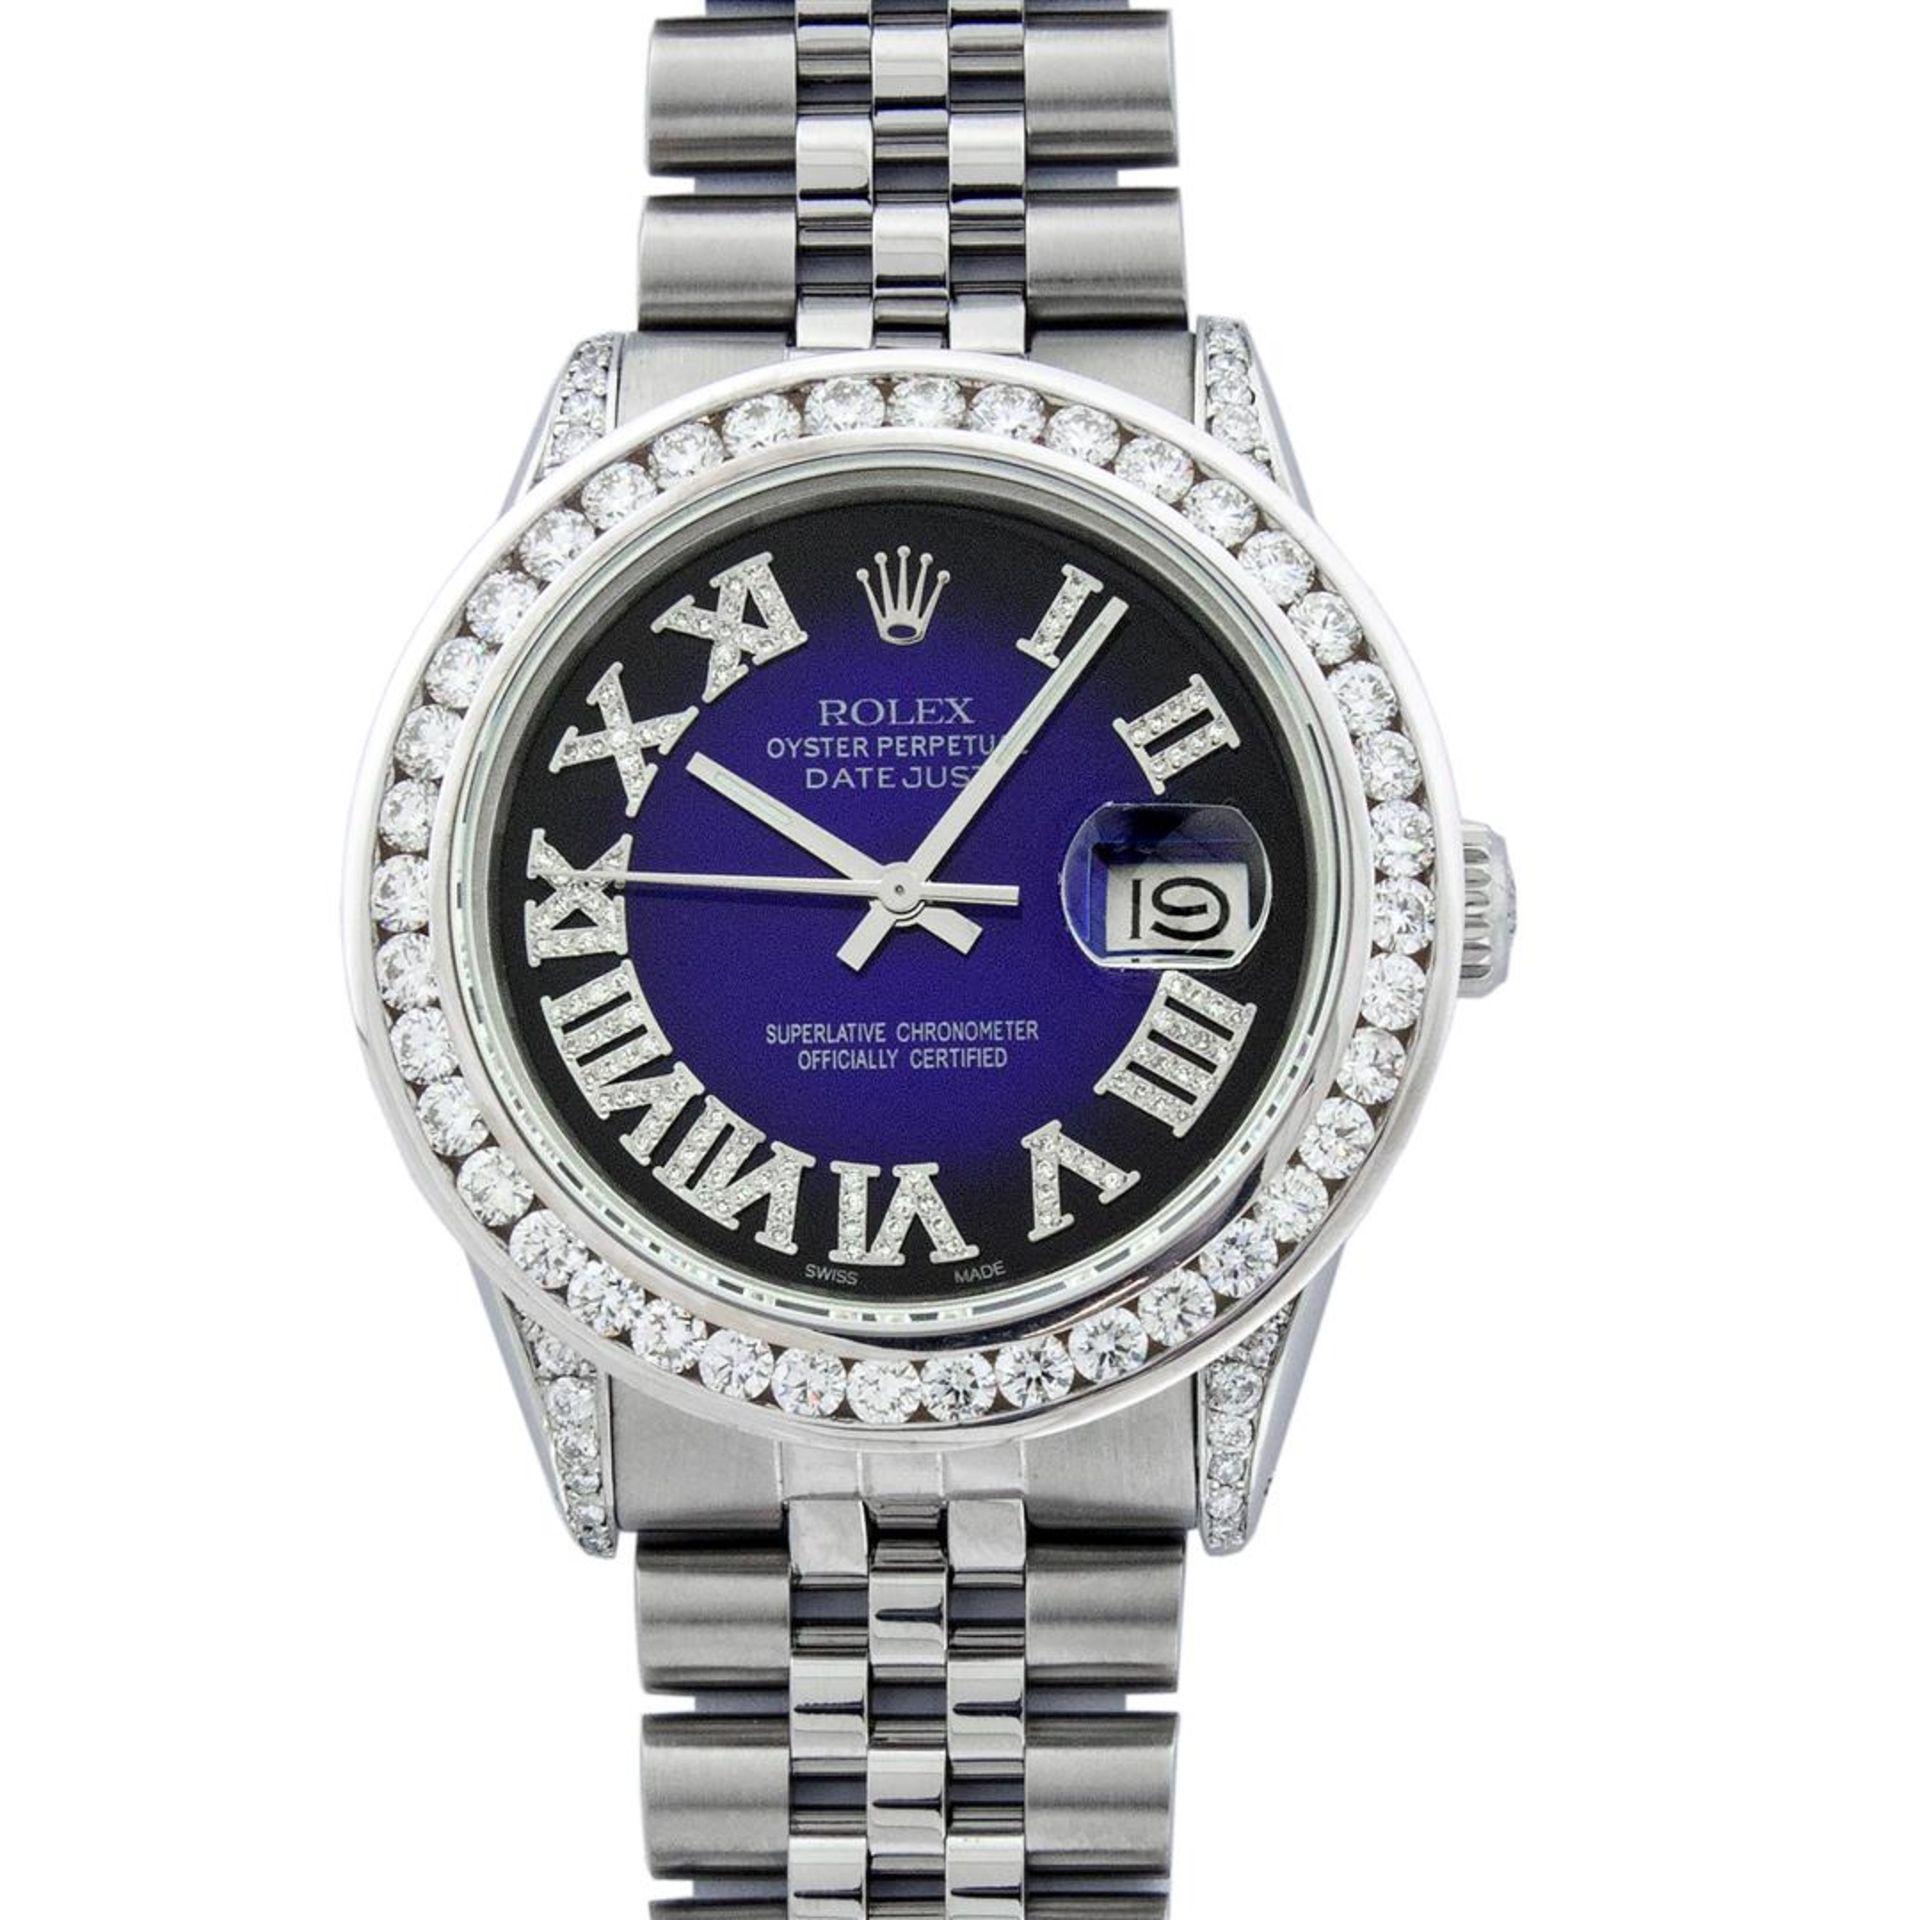 Rolex Mens Stainless Steel Blue Vignette Roman 3ctw Diamond Datejust Wristwatch - Image 2 of 9